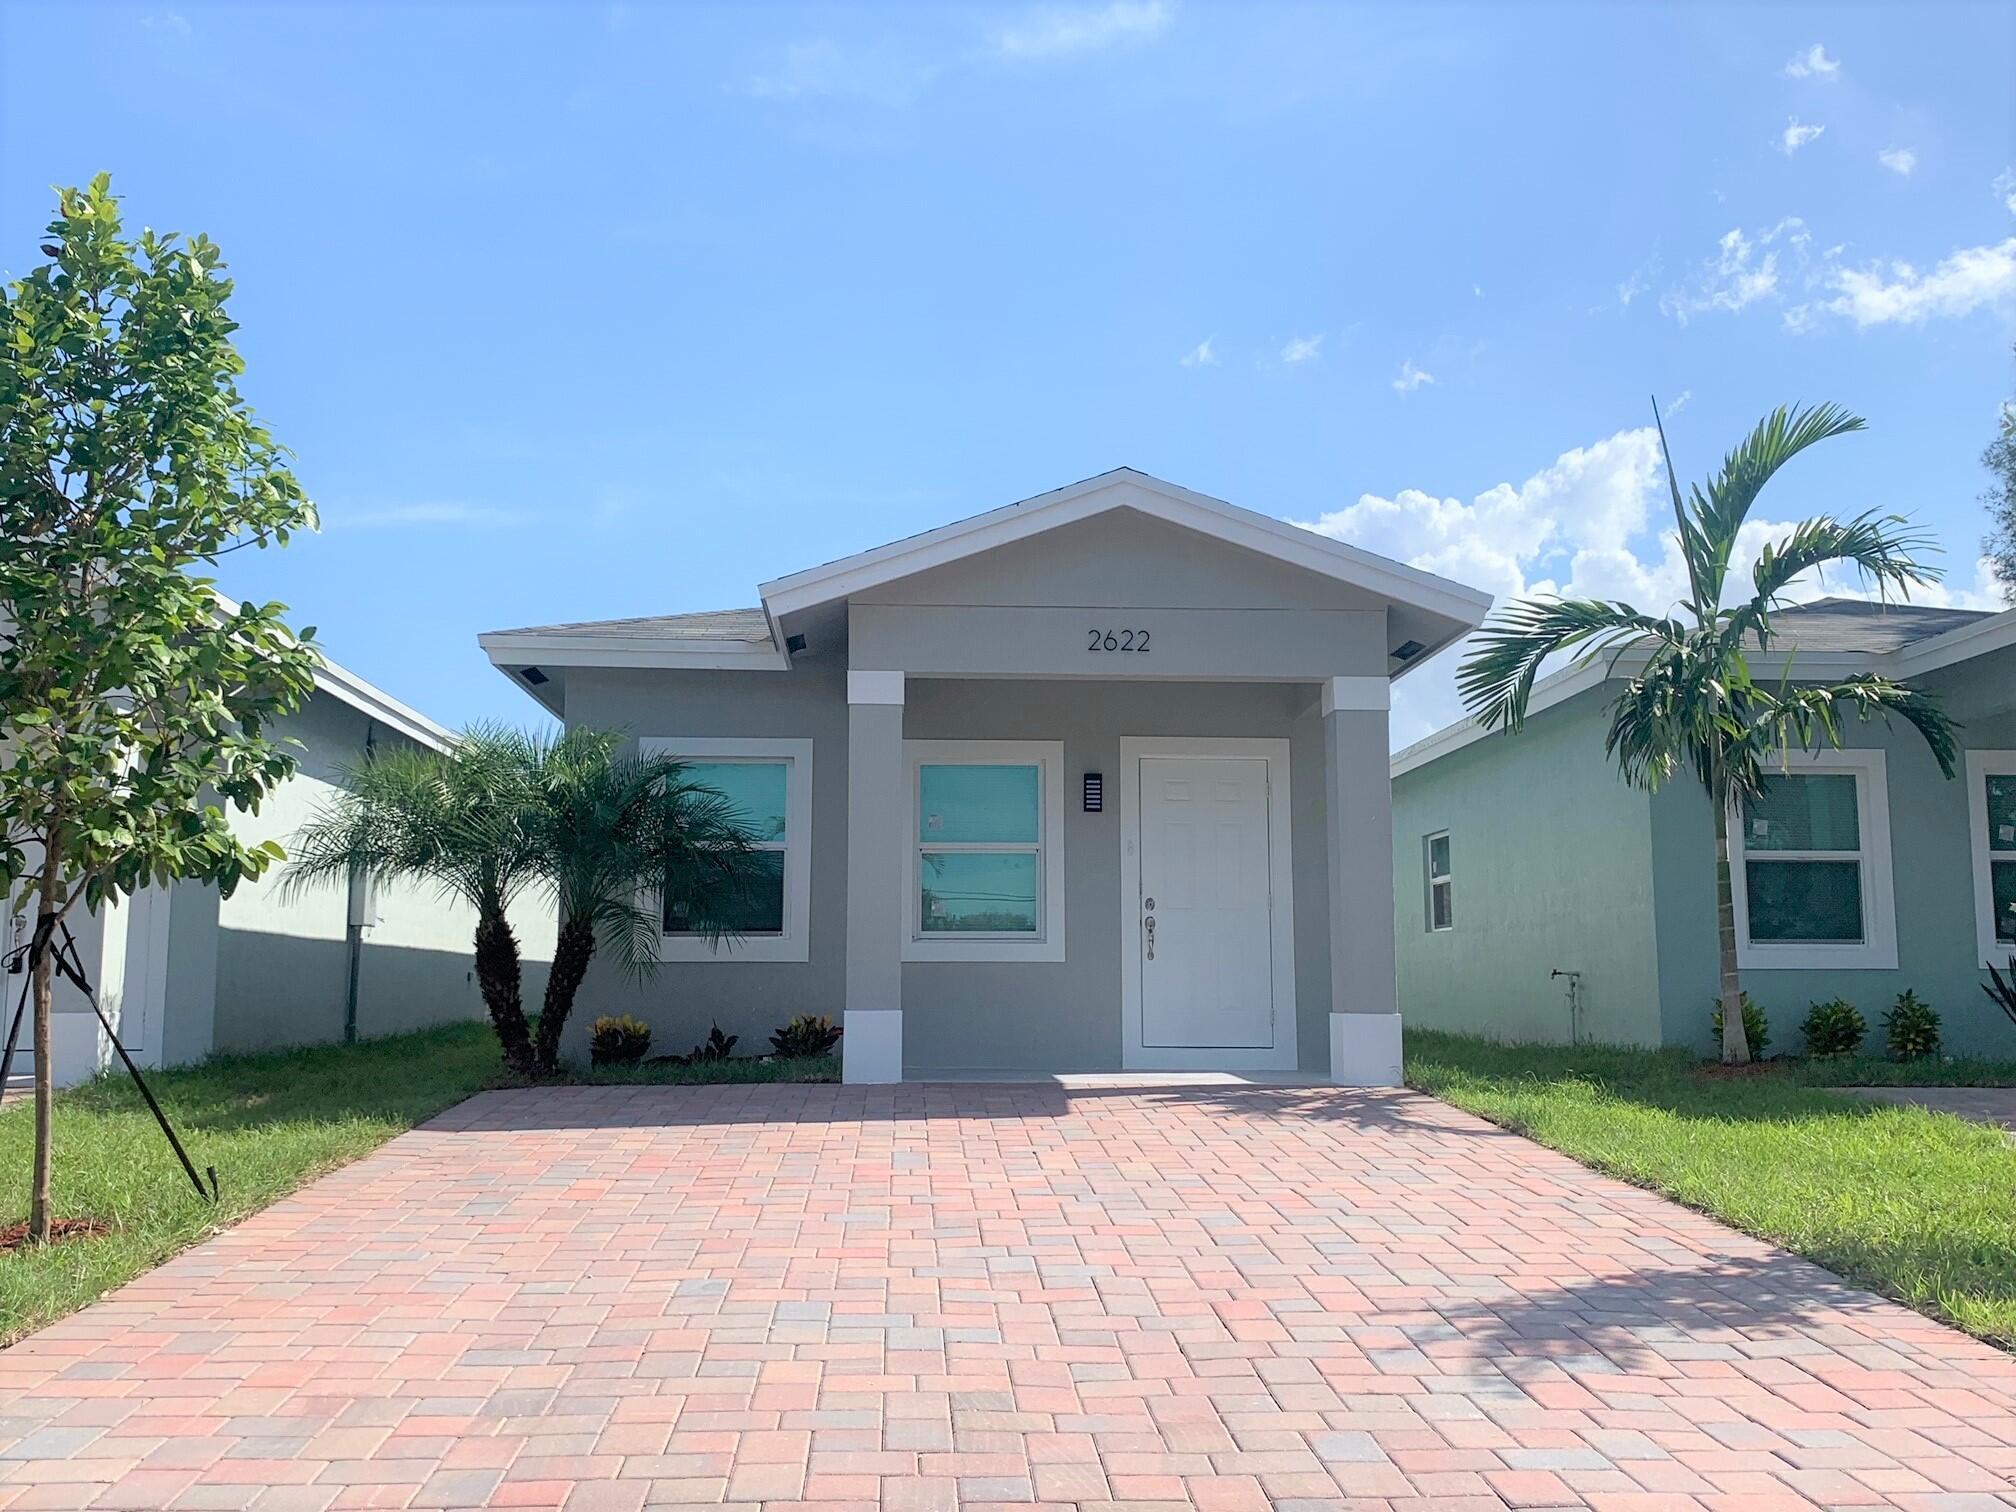 Photo of 3405 Saranac Avenue, West Palm Beach, FL 33409